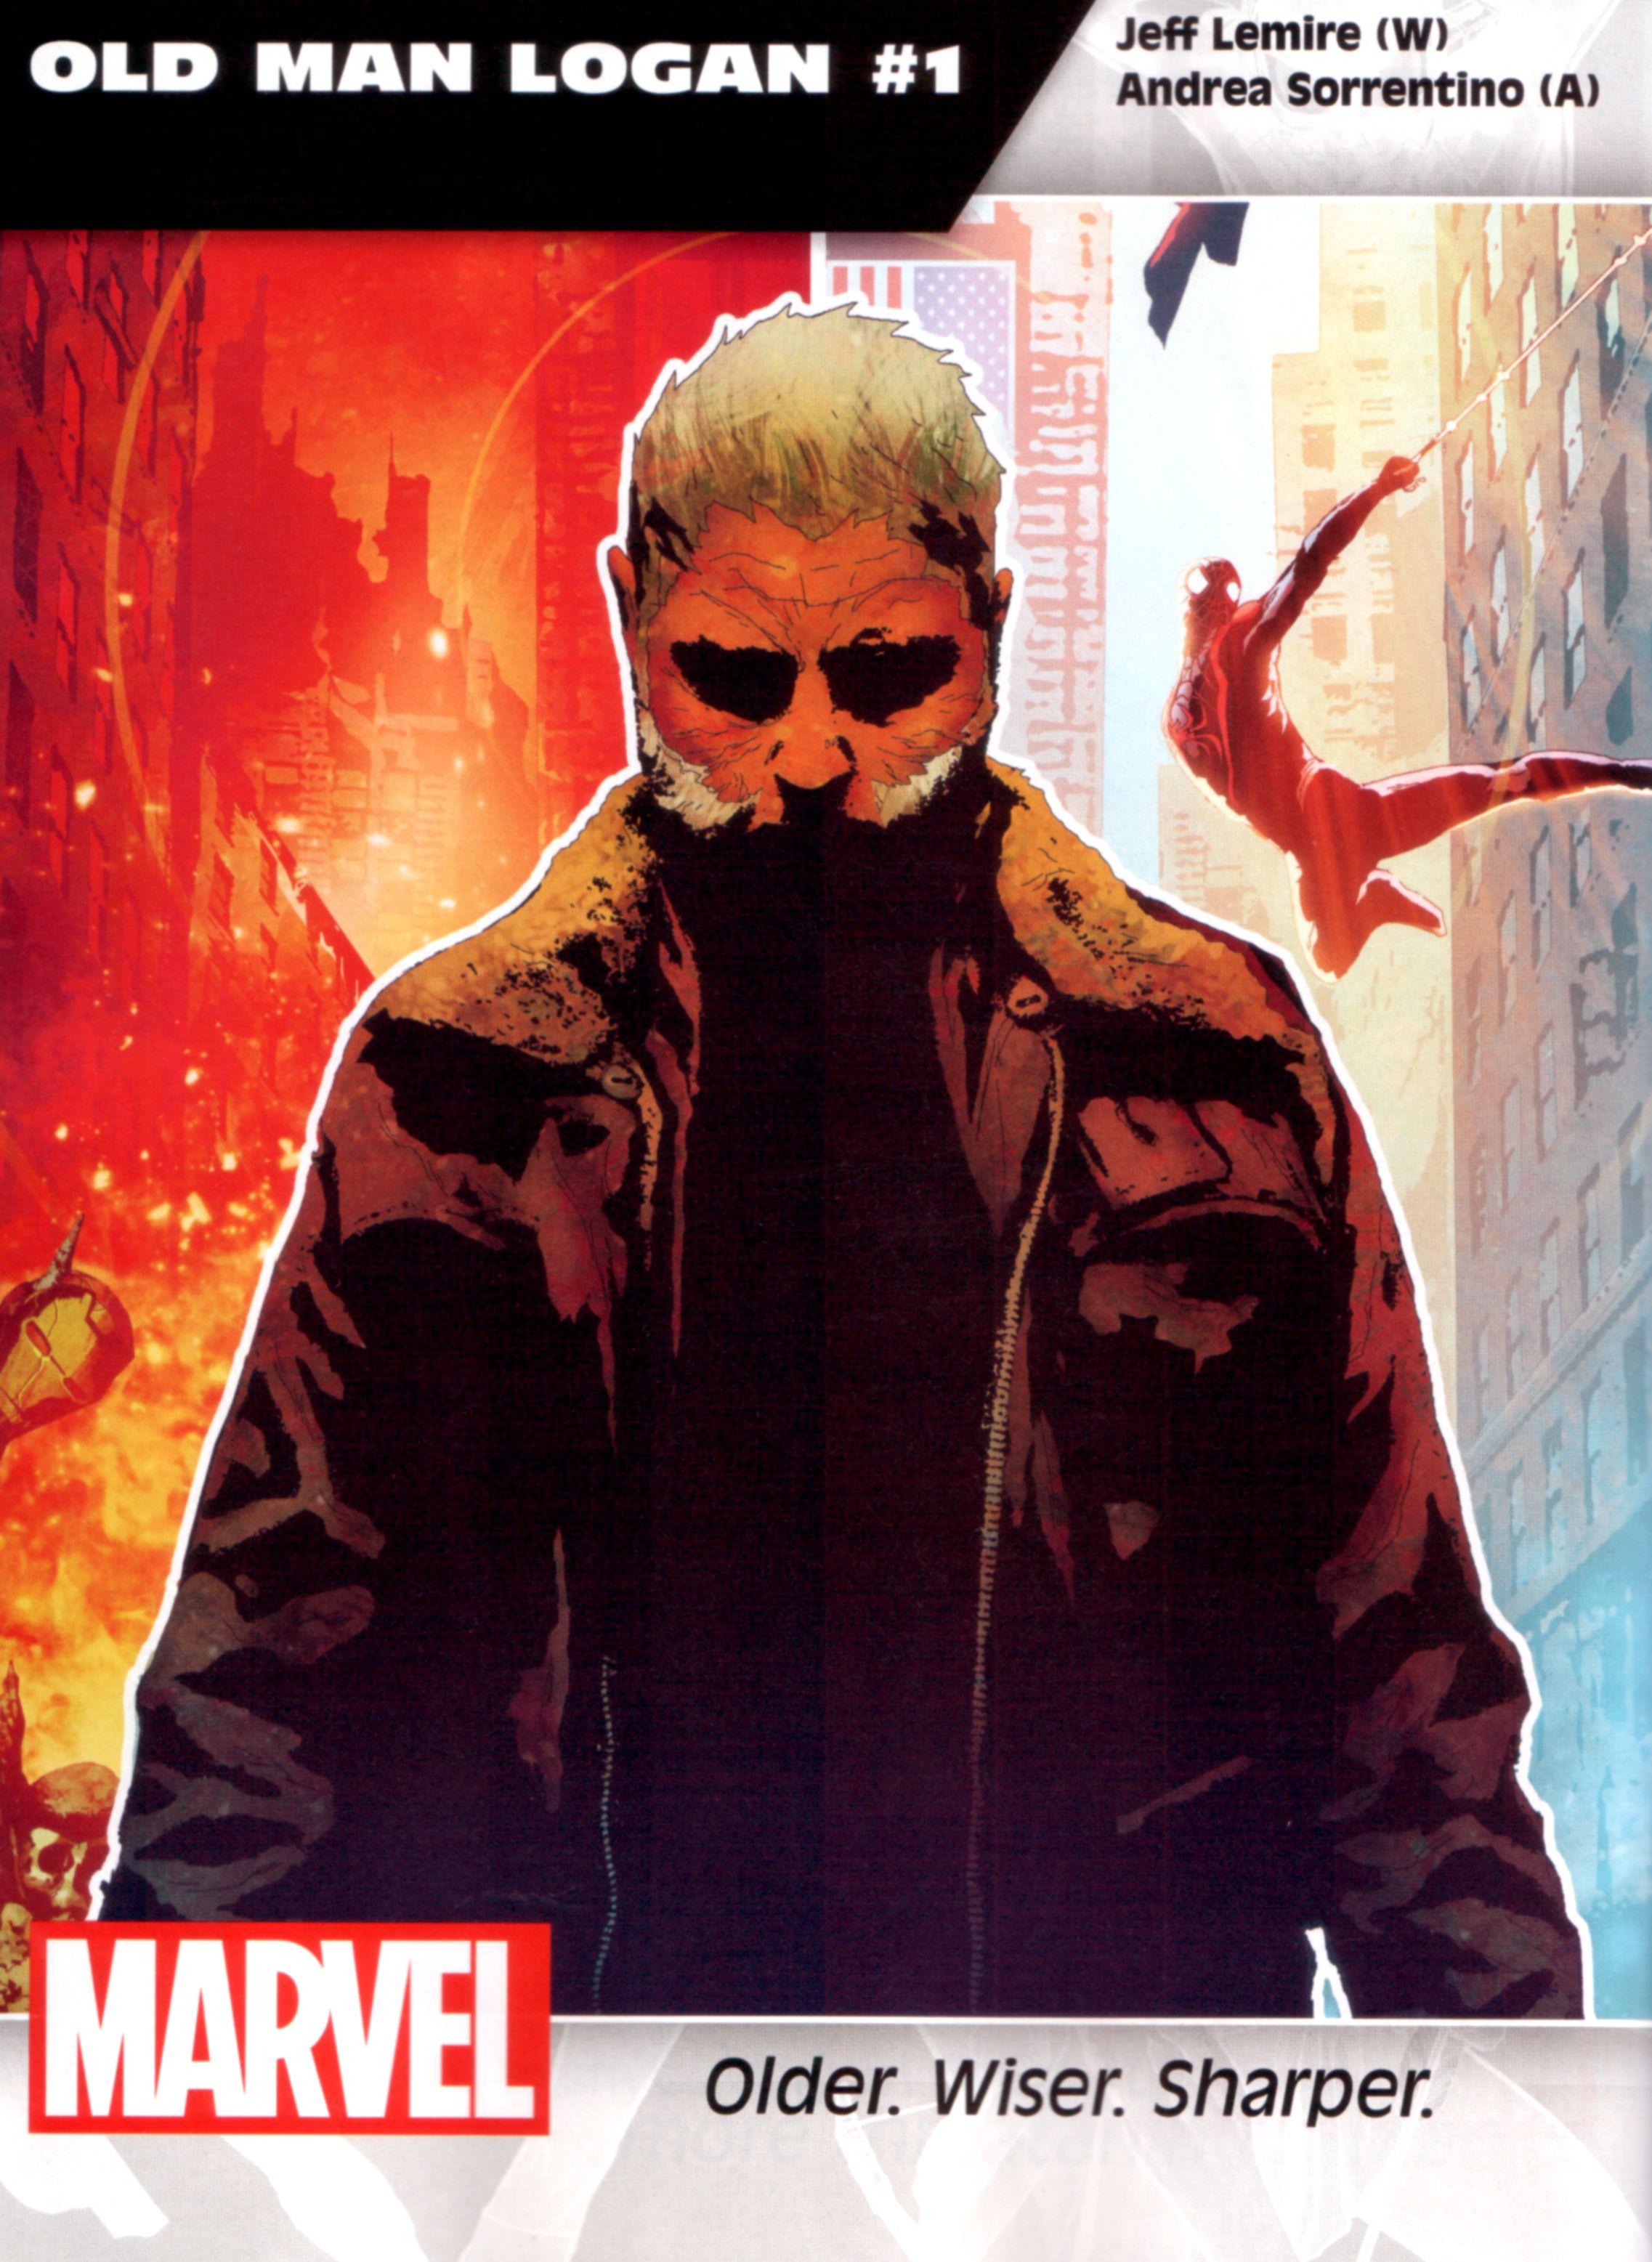 Old Man Logan #1 Volume 2 Midtown Comics